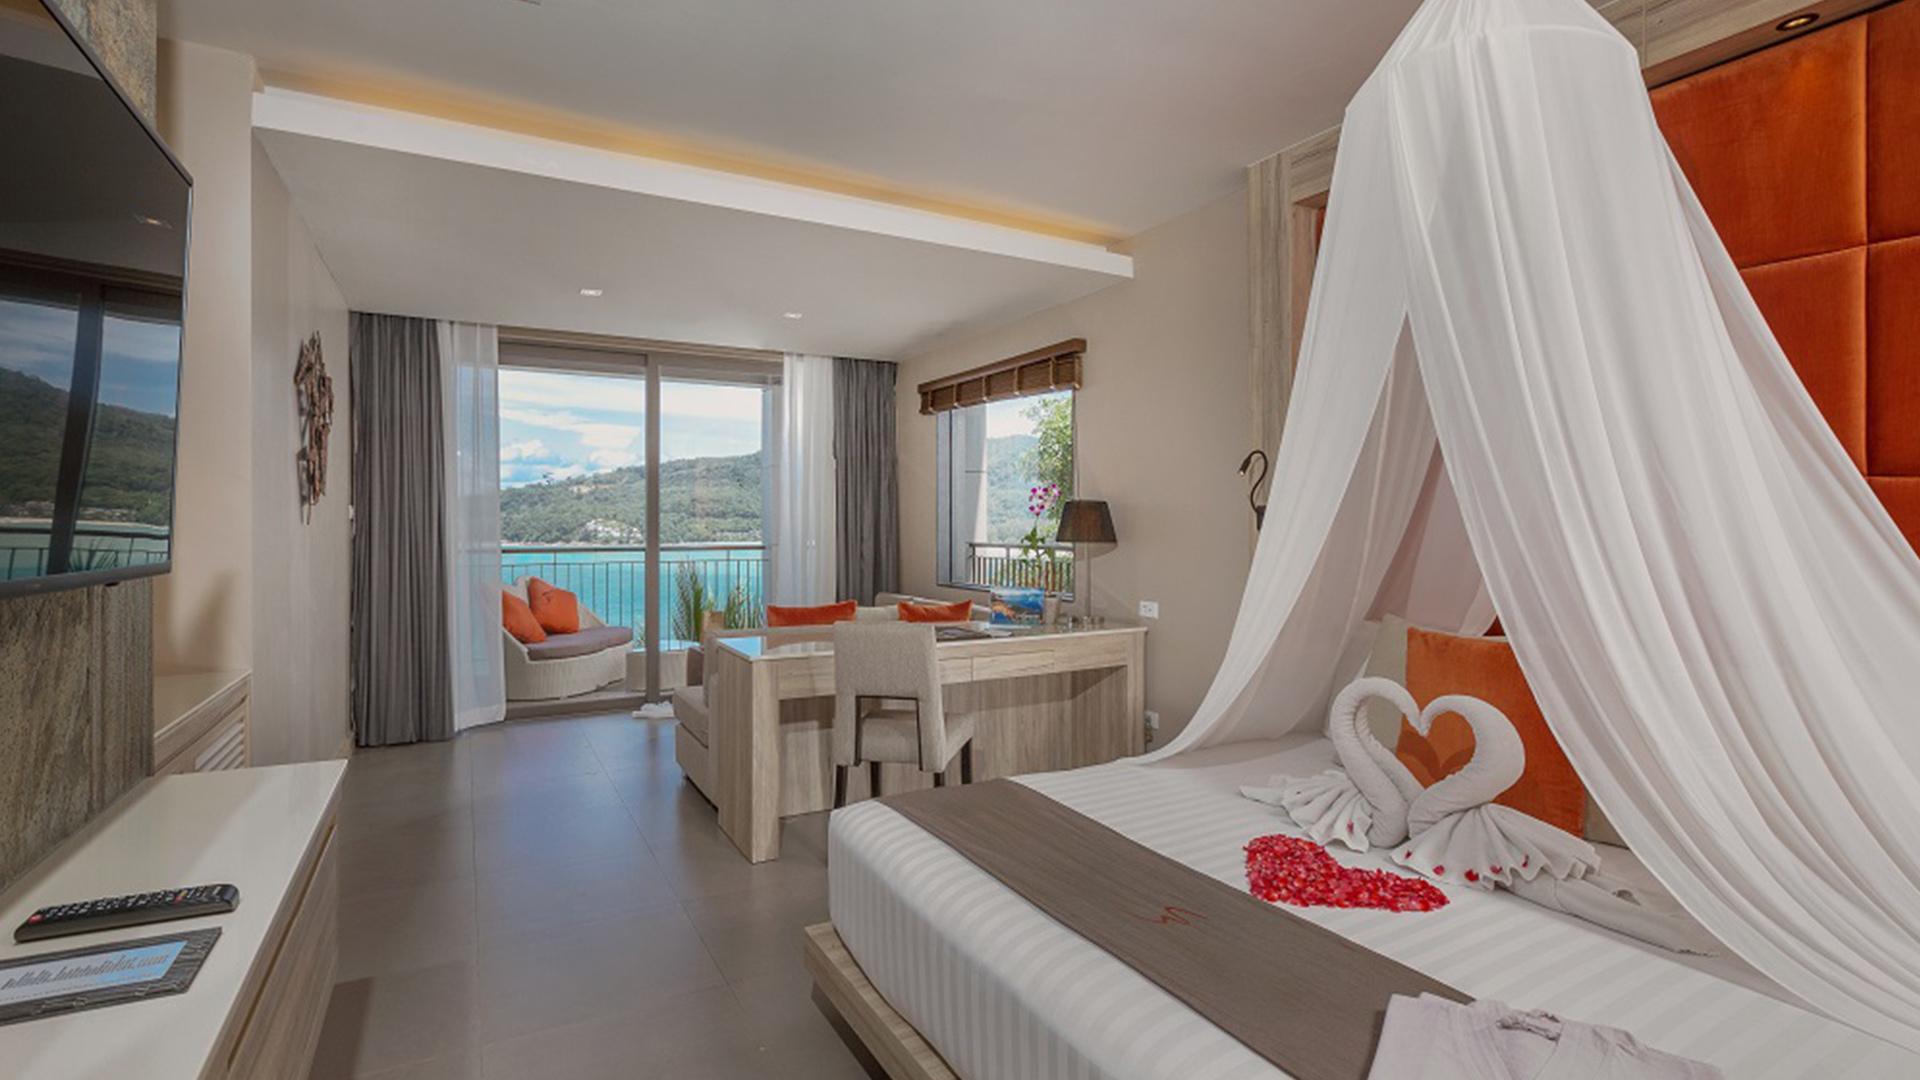 Sea View Honeymoon Suite image 1 at Cape Sienna Phuket Gourmet Hotel & Villas by Amphoe Kathu, Chang Wat Phuket, Thailand